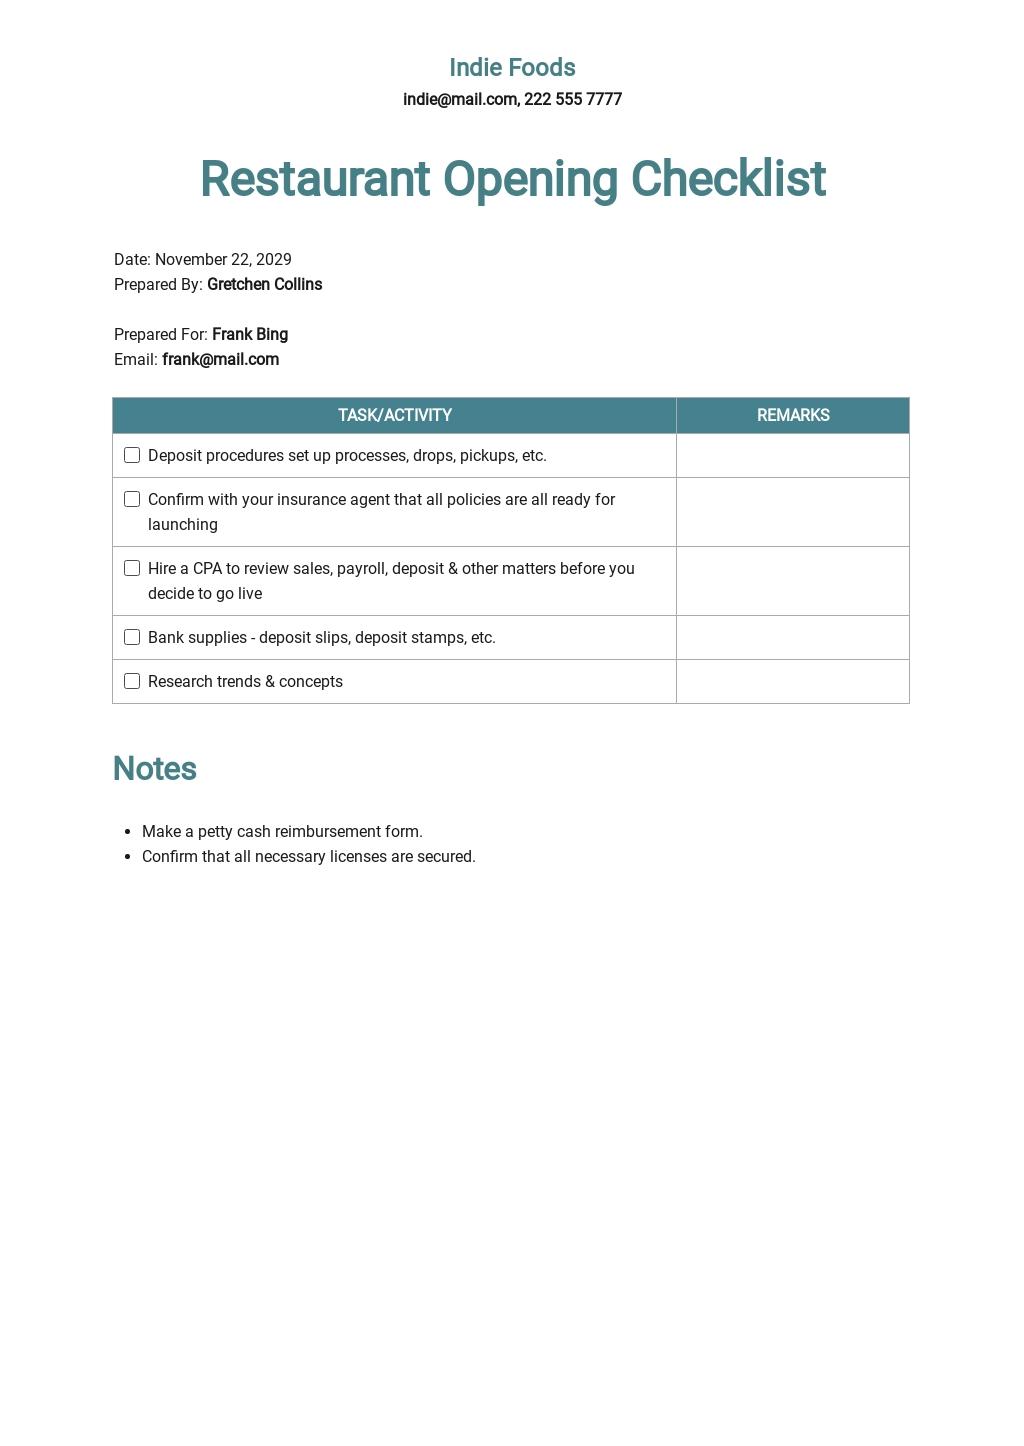 Restaurant Opening Checklist Form Template.jpe